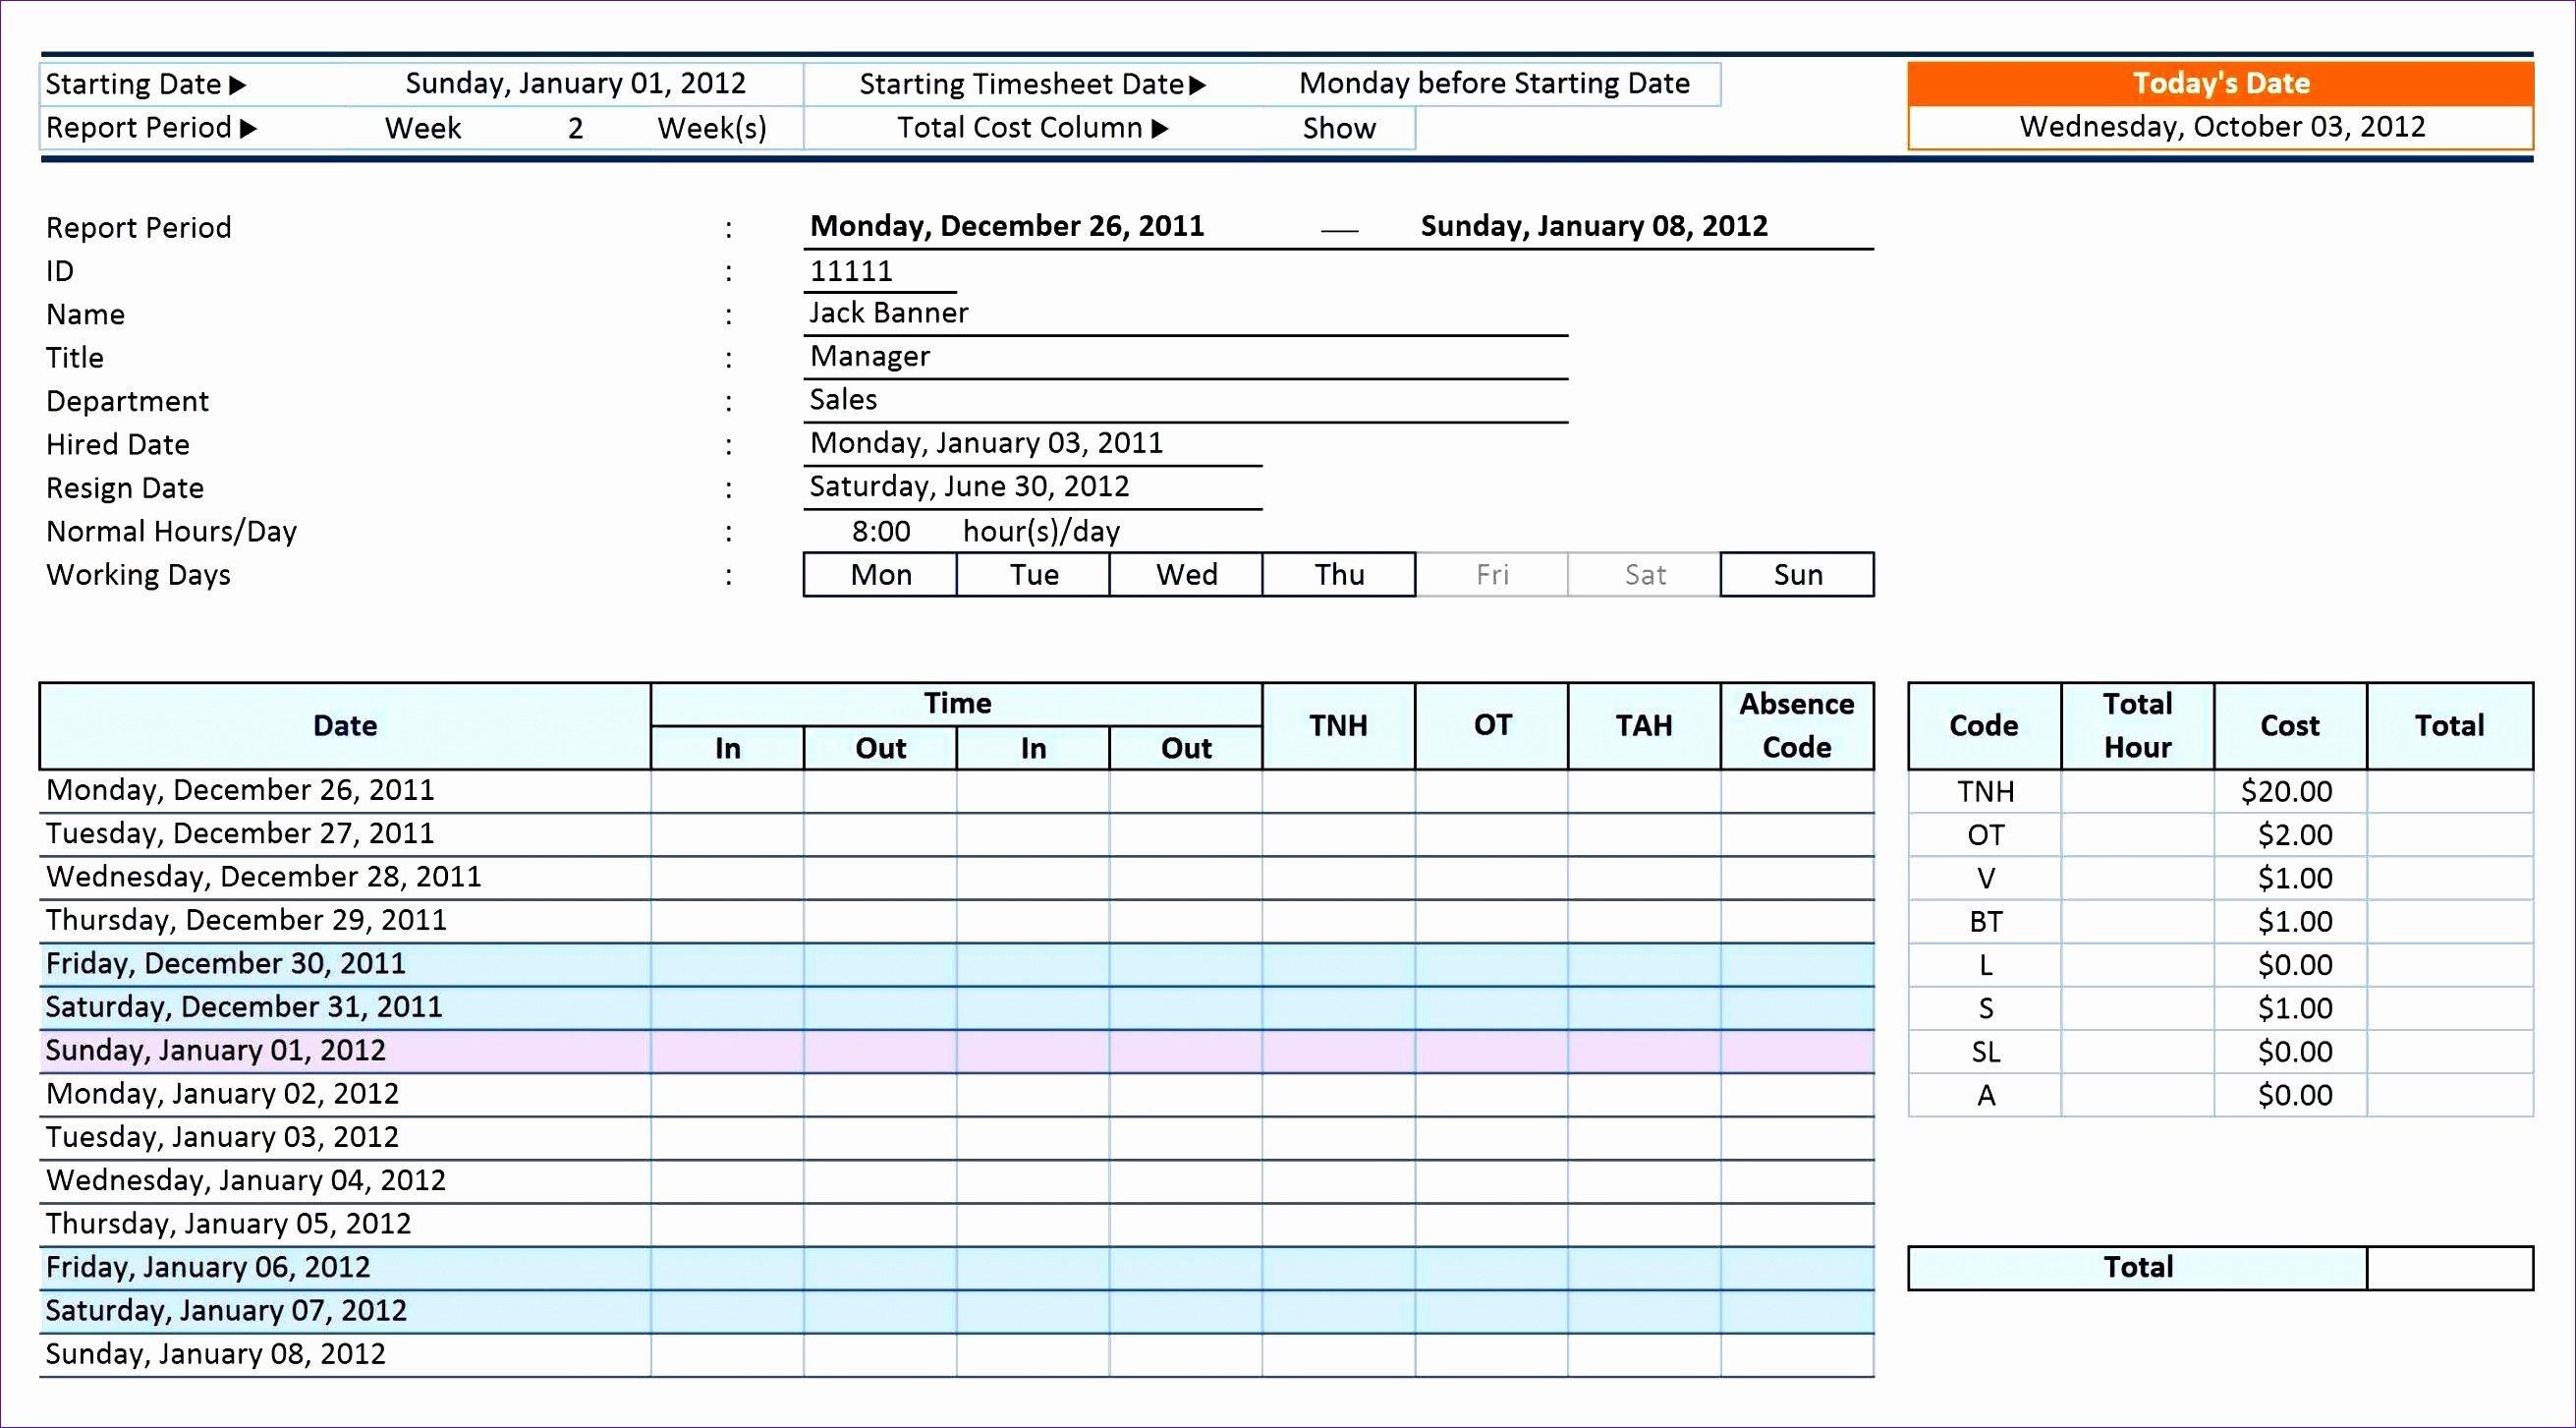 Workforce Plan Template Excel Beautiful Workforce Planning Template Excel Tfzpz Best 12